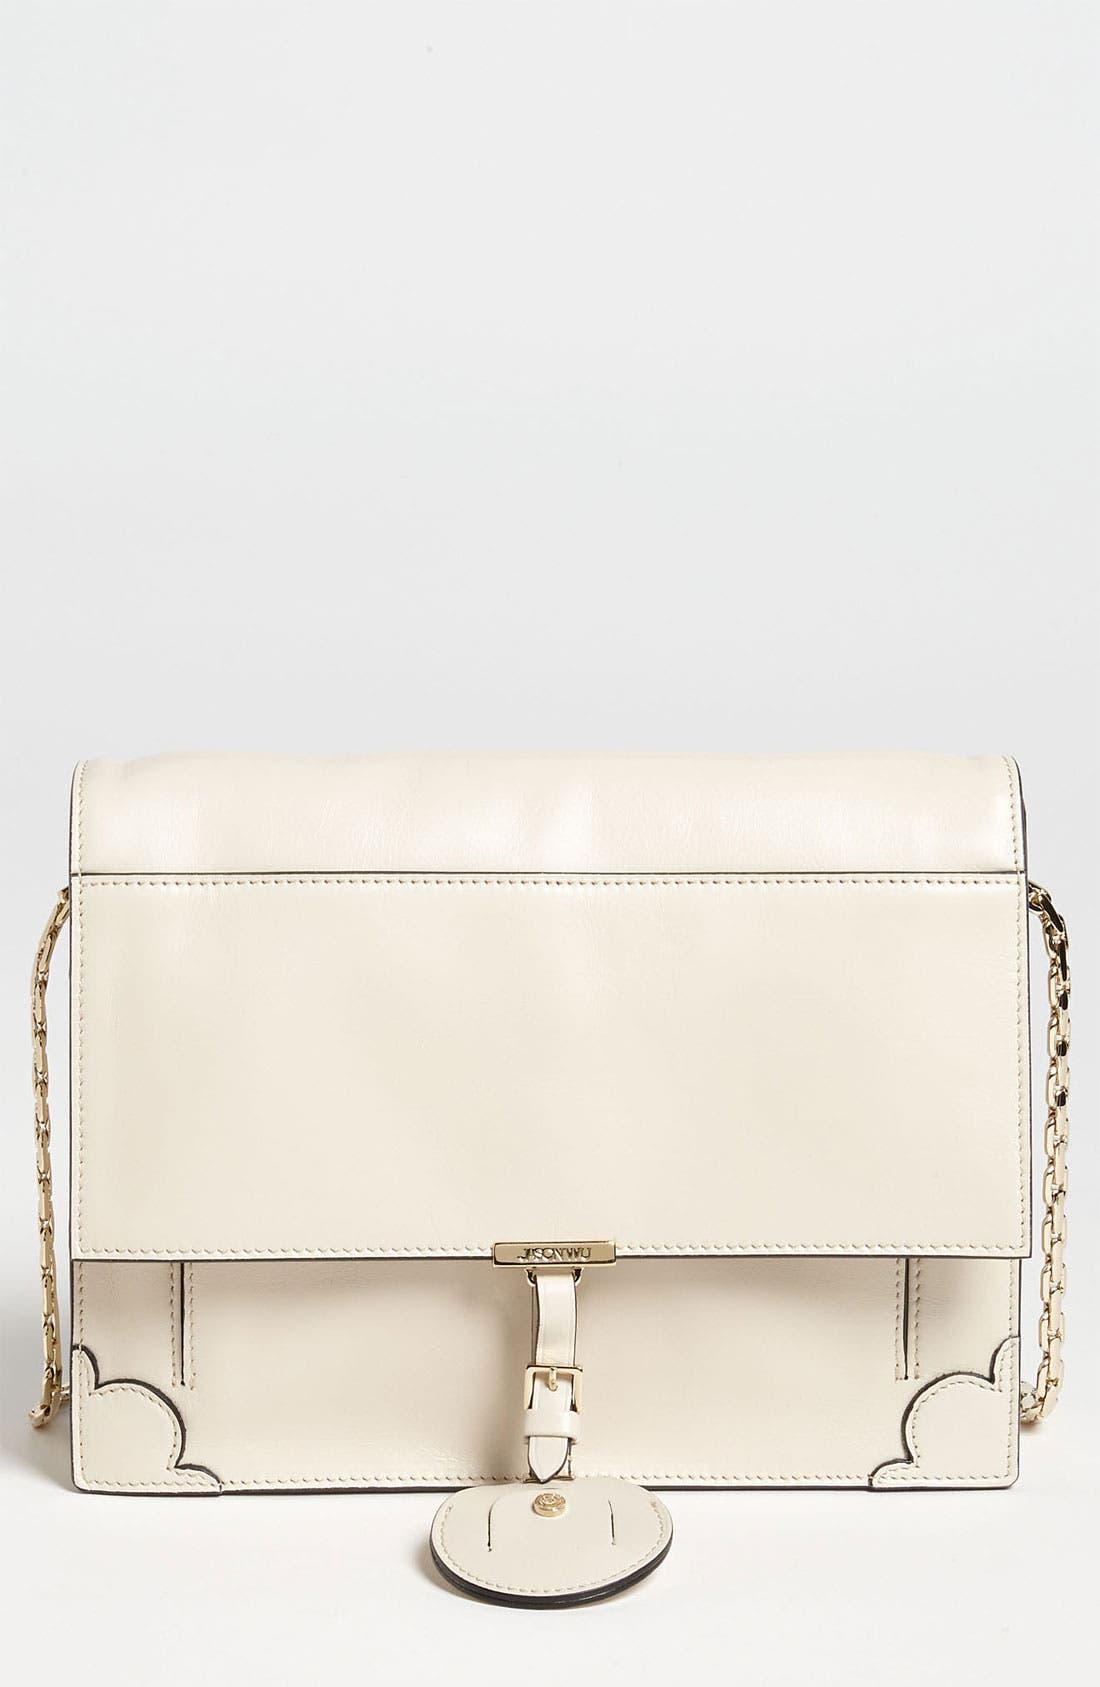 Alternate Image 1 Selected - Jason Wu 'Jourdan' Leather Crossbody Bag